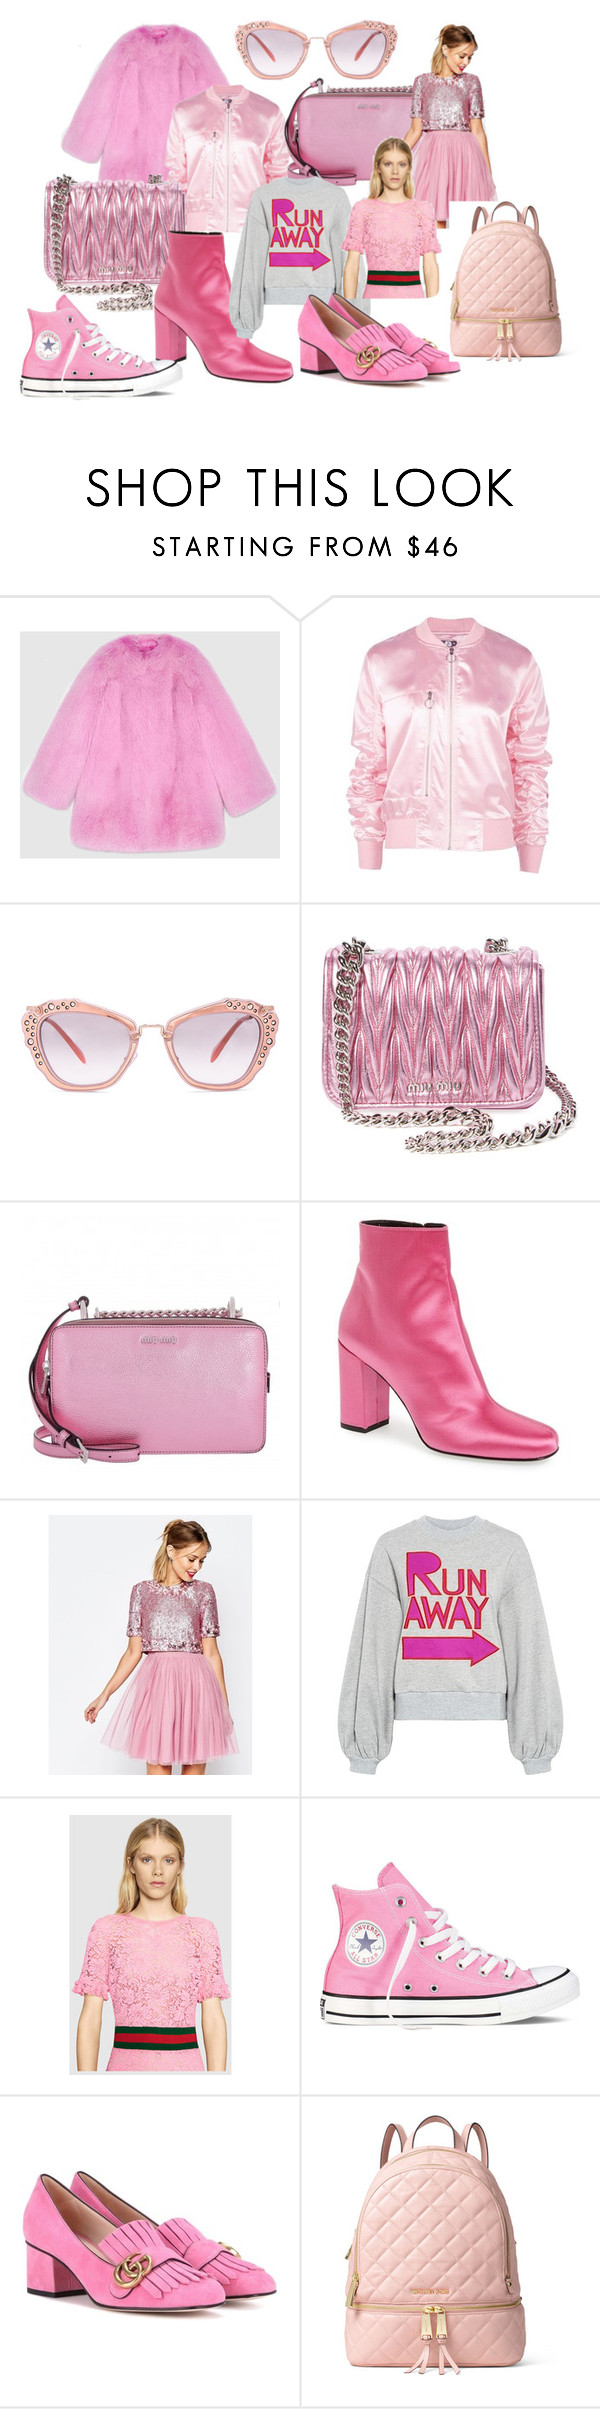 """pink things"" by sabrinabuizza on Polyvore featuring mode, Gucci, Boohoo, Miu Miu, Yves Saint Laurent, ASOS, Karen Walker, Converse et MICHAEL Michael Kors"